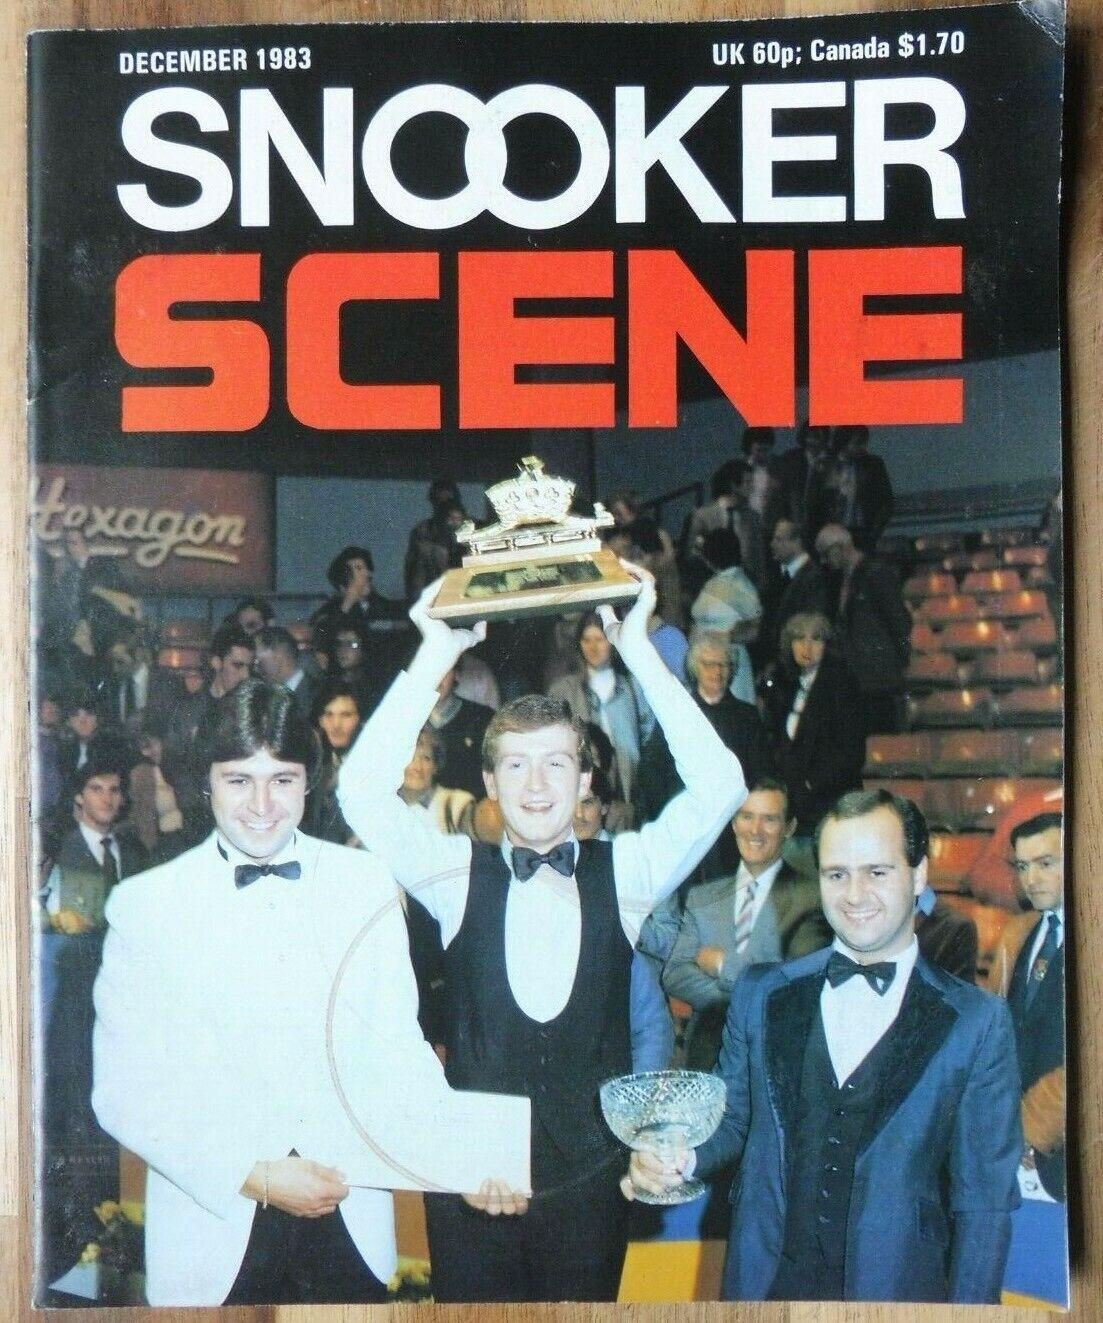 Snooker Scene Magazine, December 1983, Good Condition.